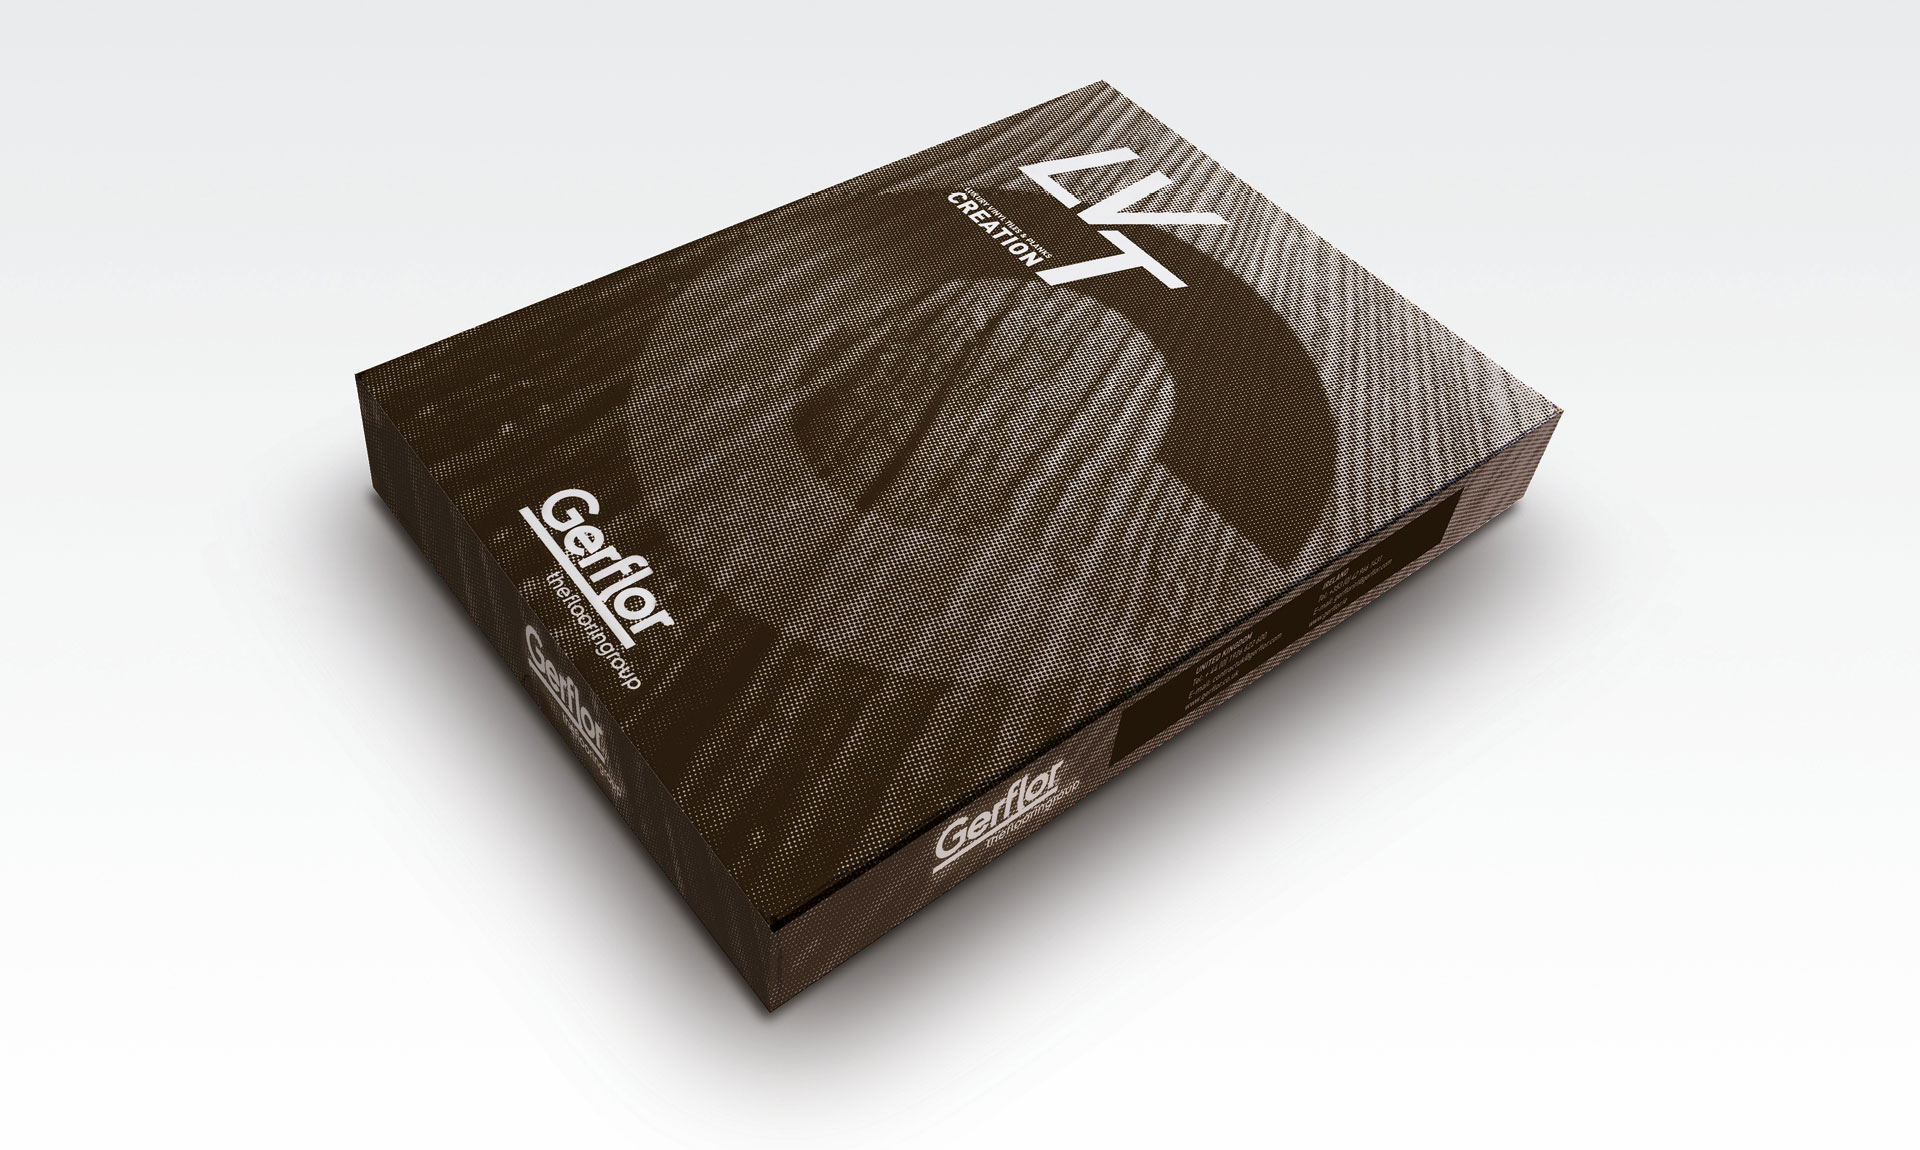 Gerflor - Box / Packaging Design